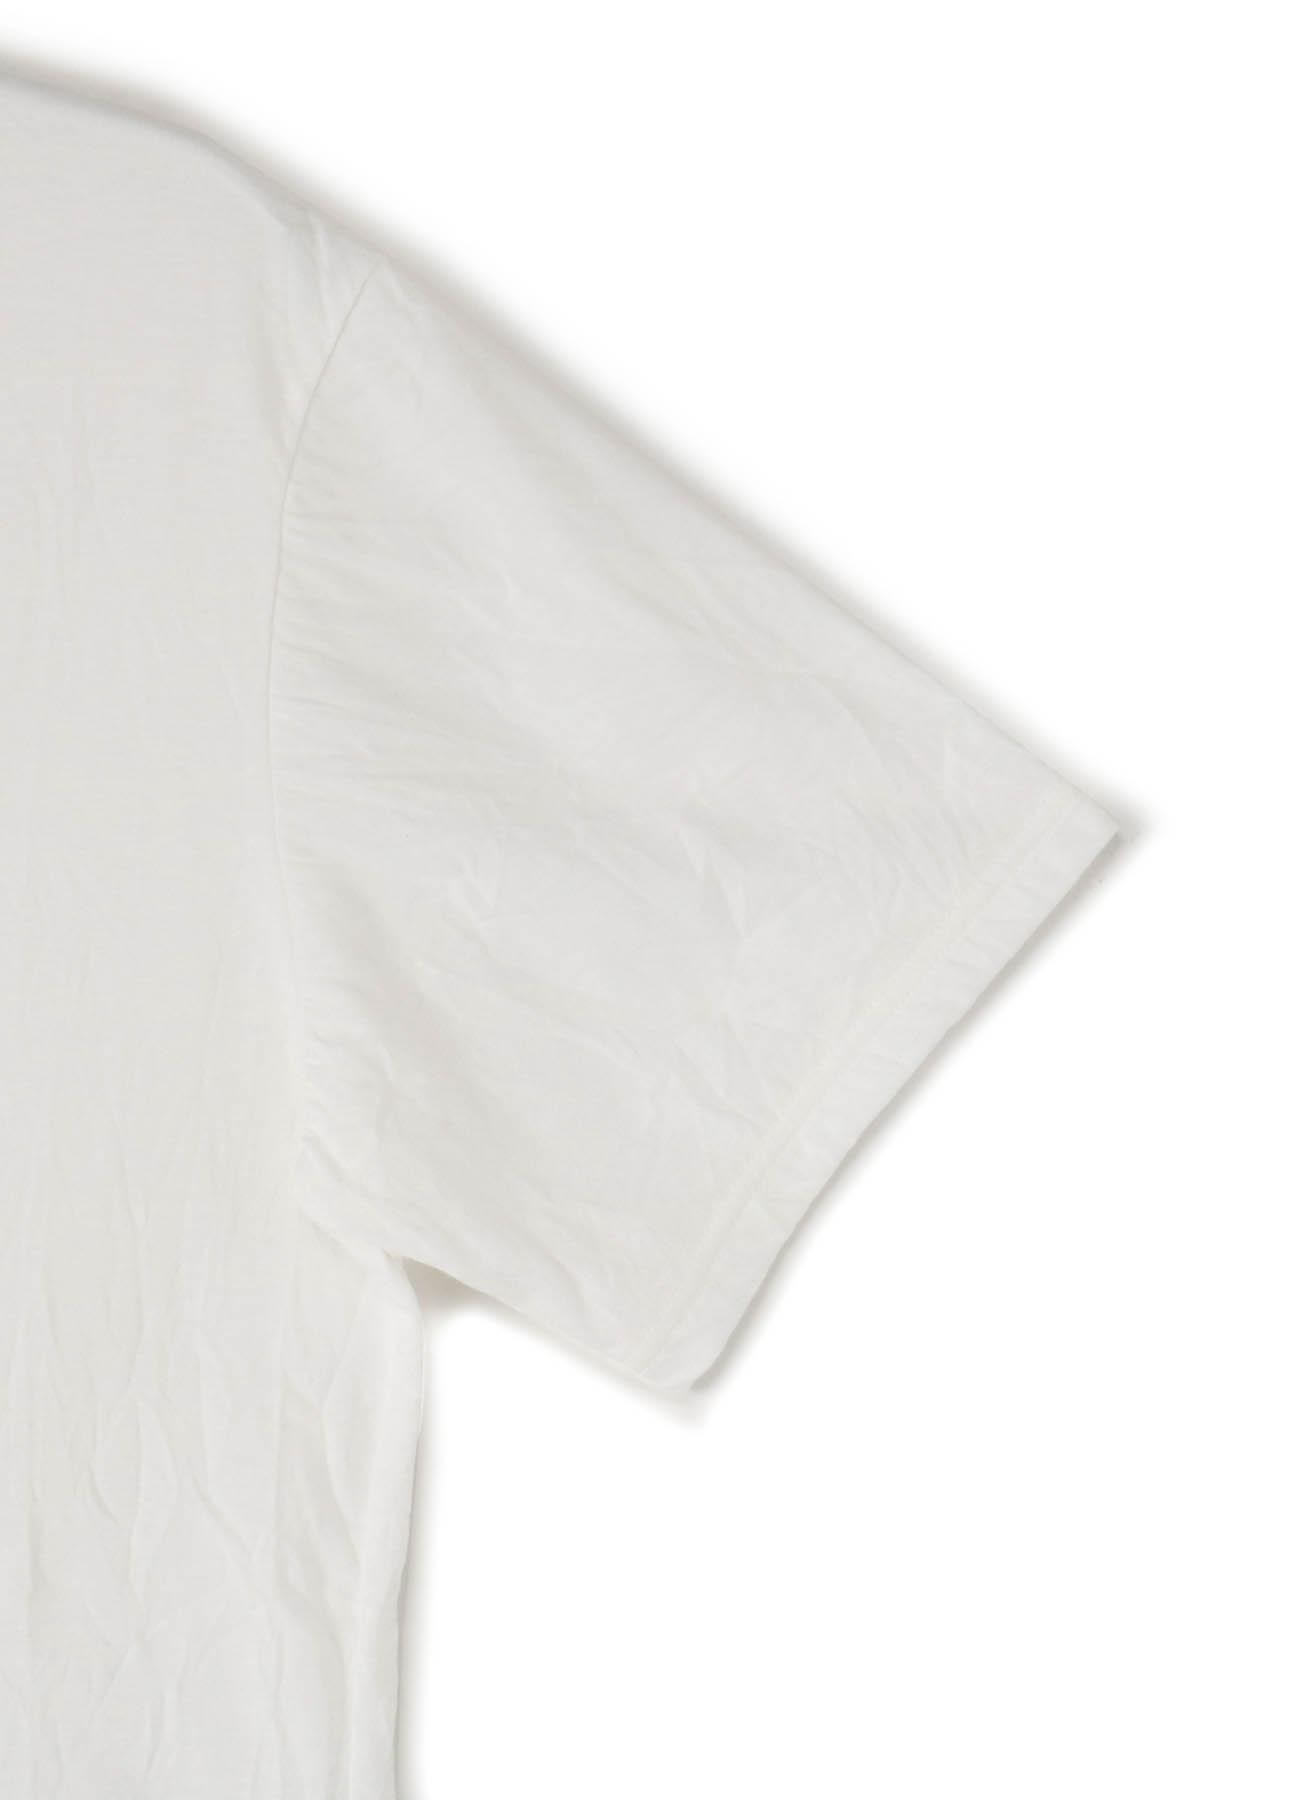 C/Pe Washer Jersey Hem Docking Short Sleeves Cut Sew